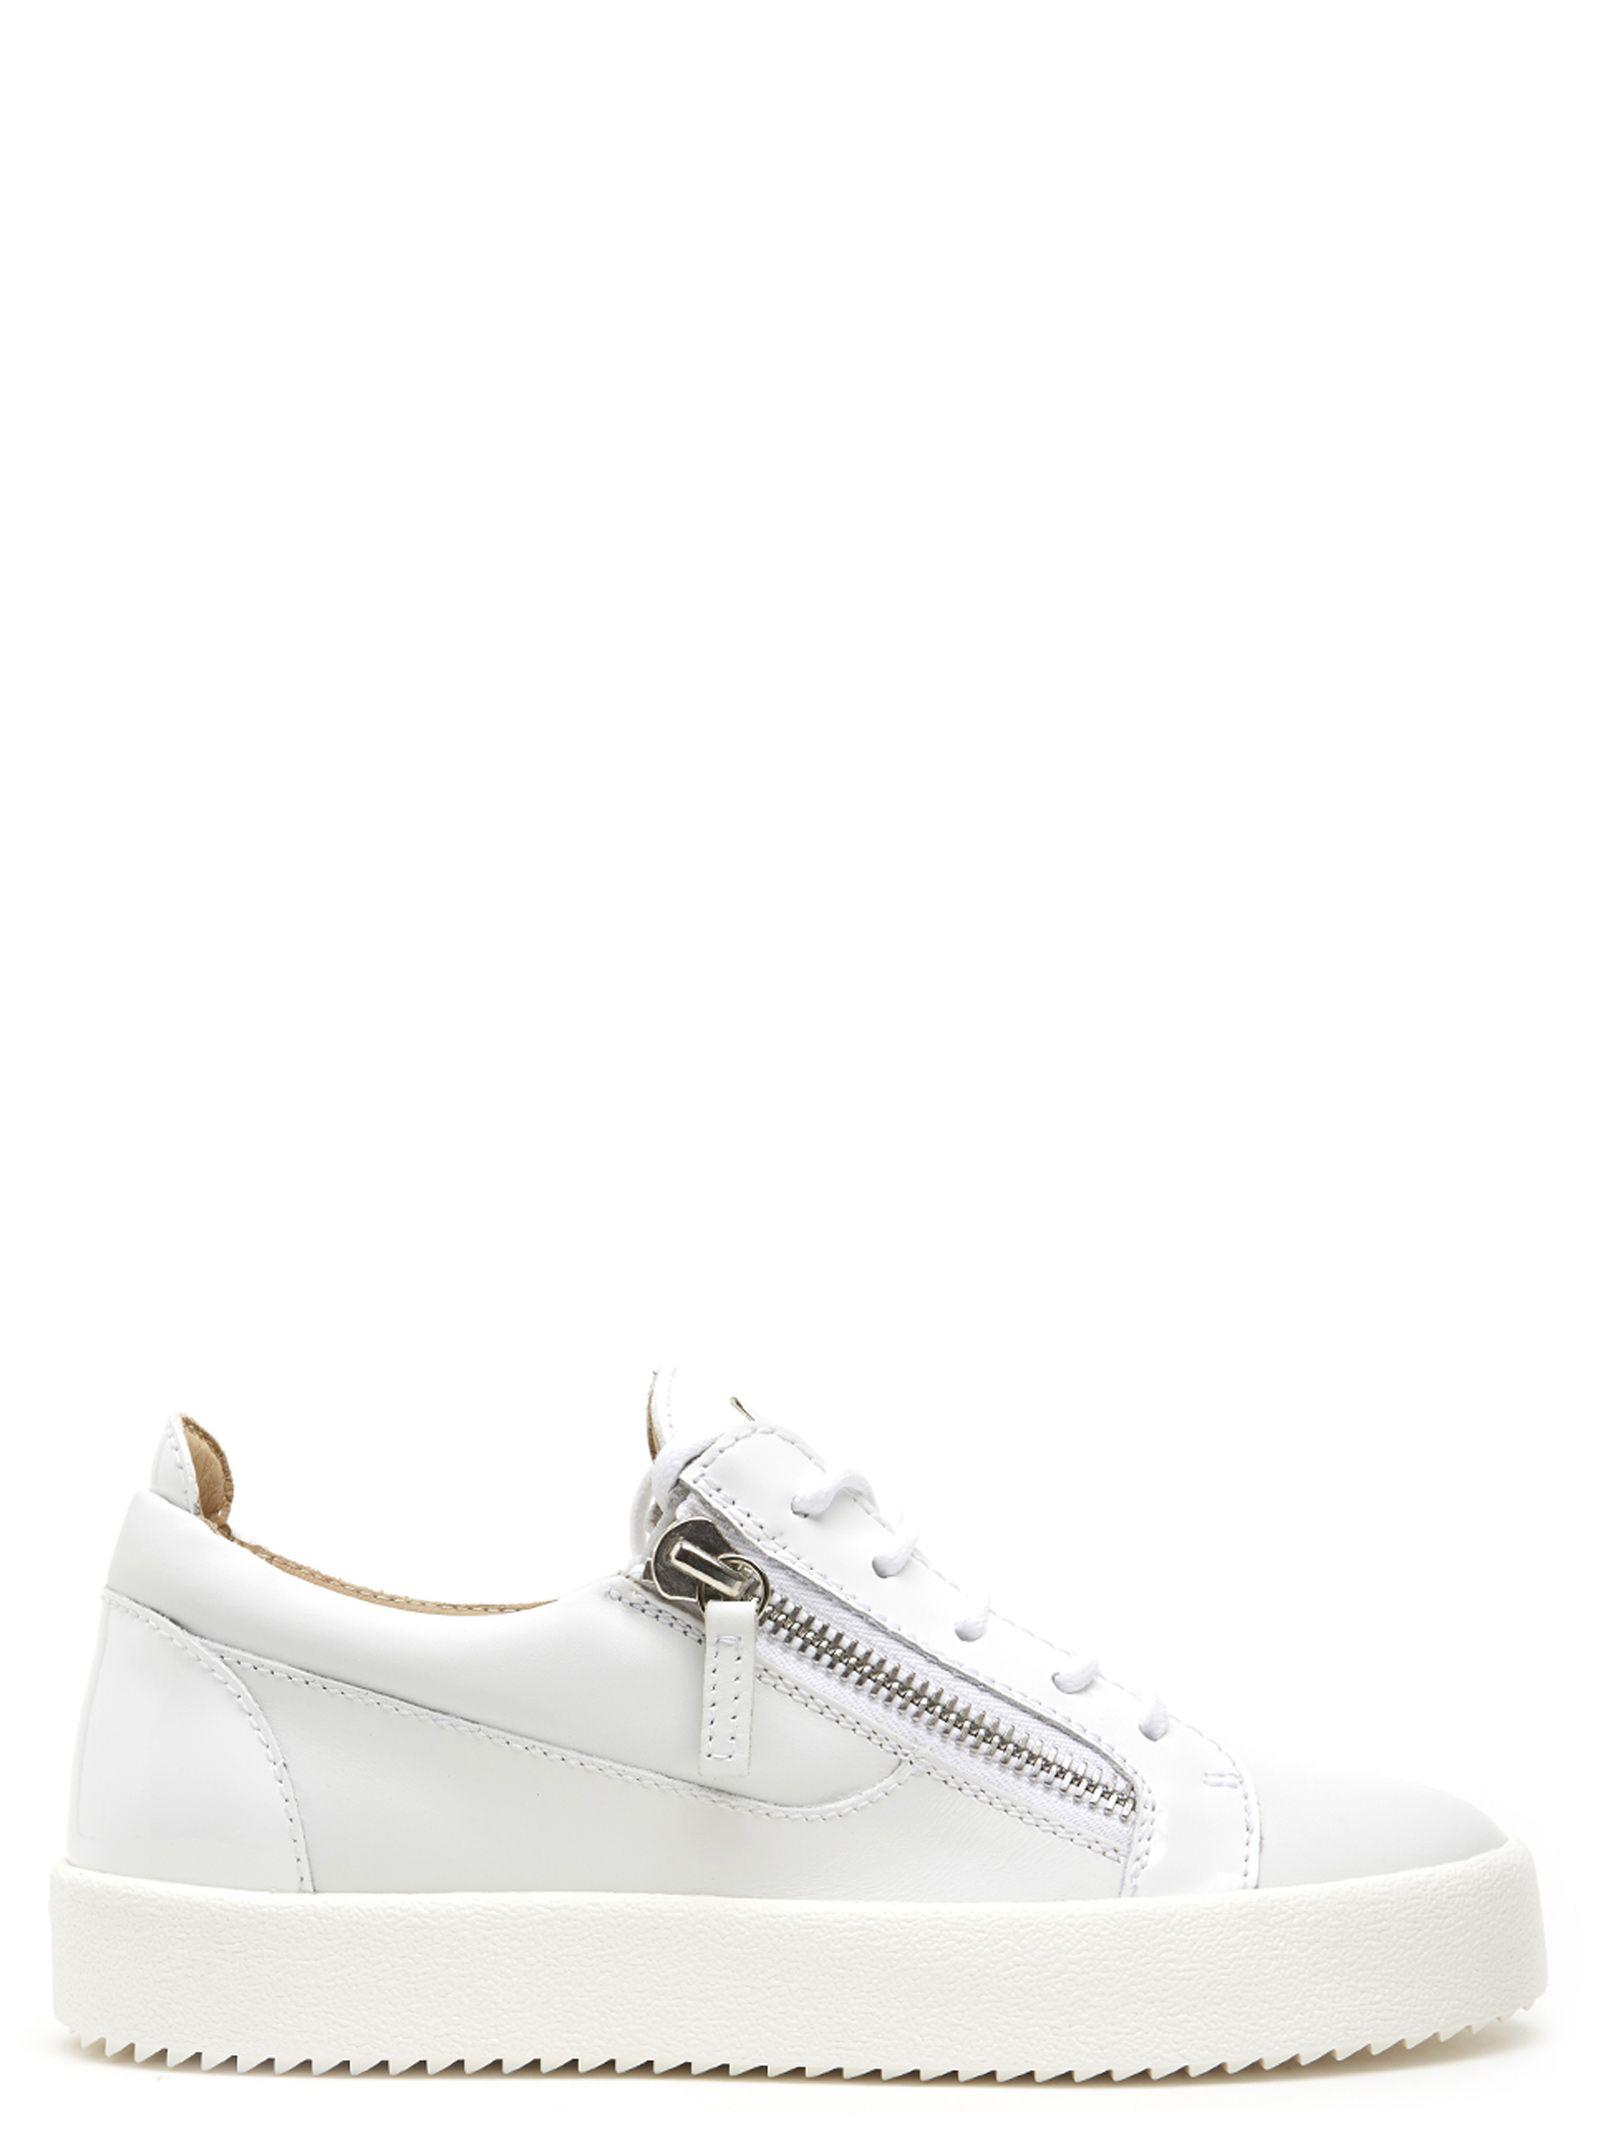 4c00d5446ae84 Giuseppe Zanotti Nicki Low-Top Sneakers In White   ModeSens